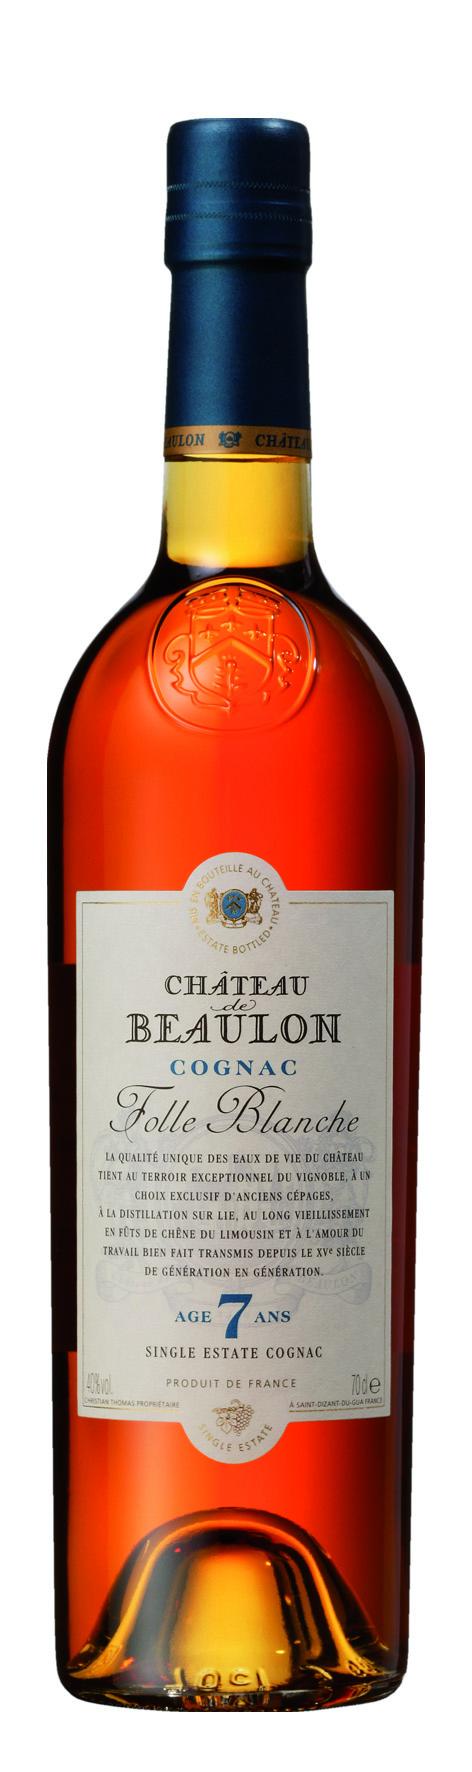 Château de Beaulon Cognac, V.S.O.P. 7 Years Old